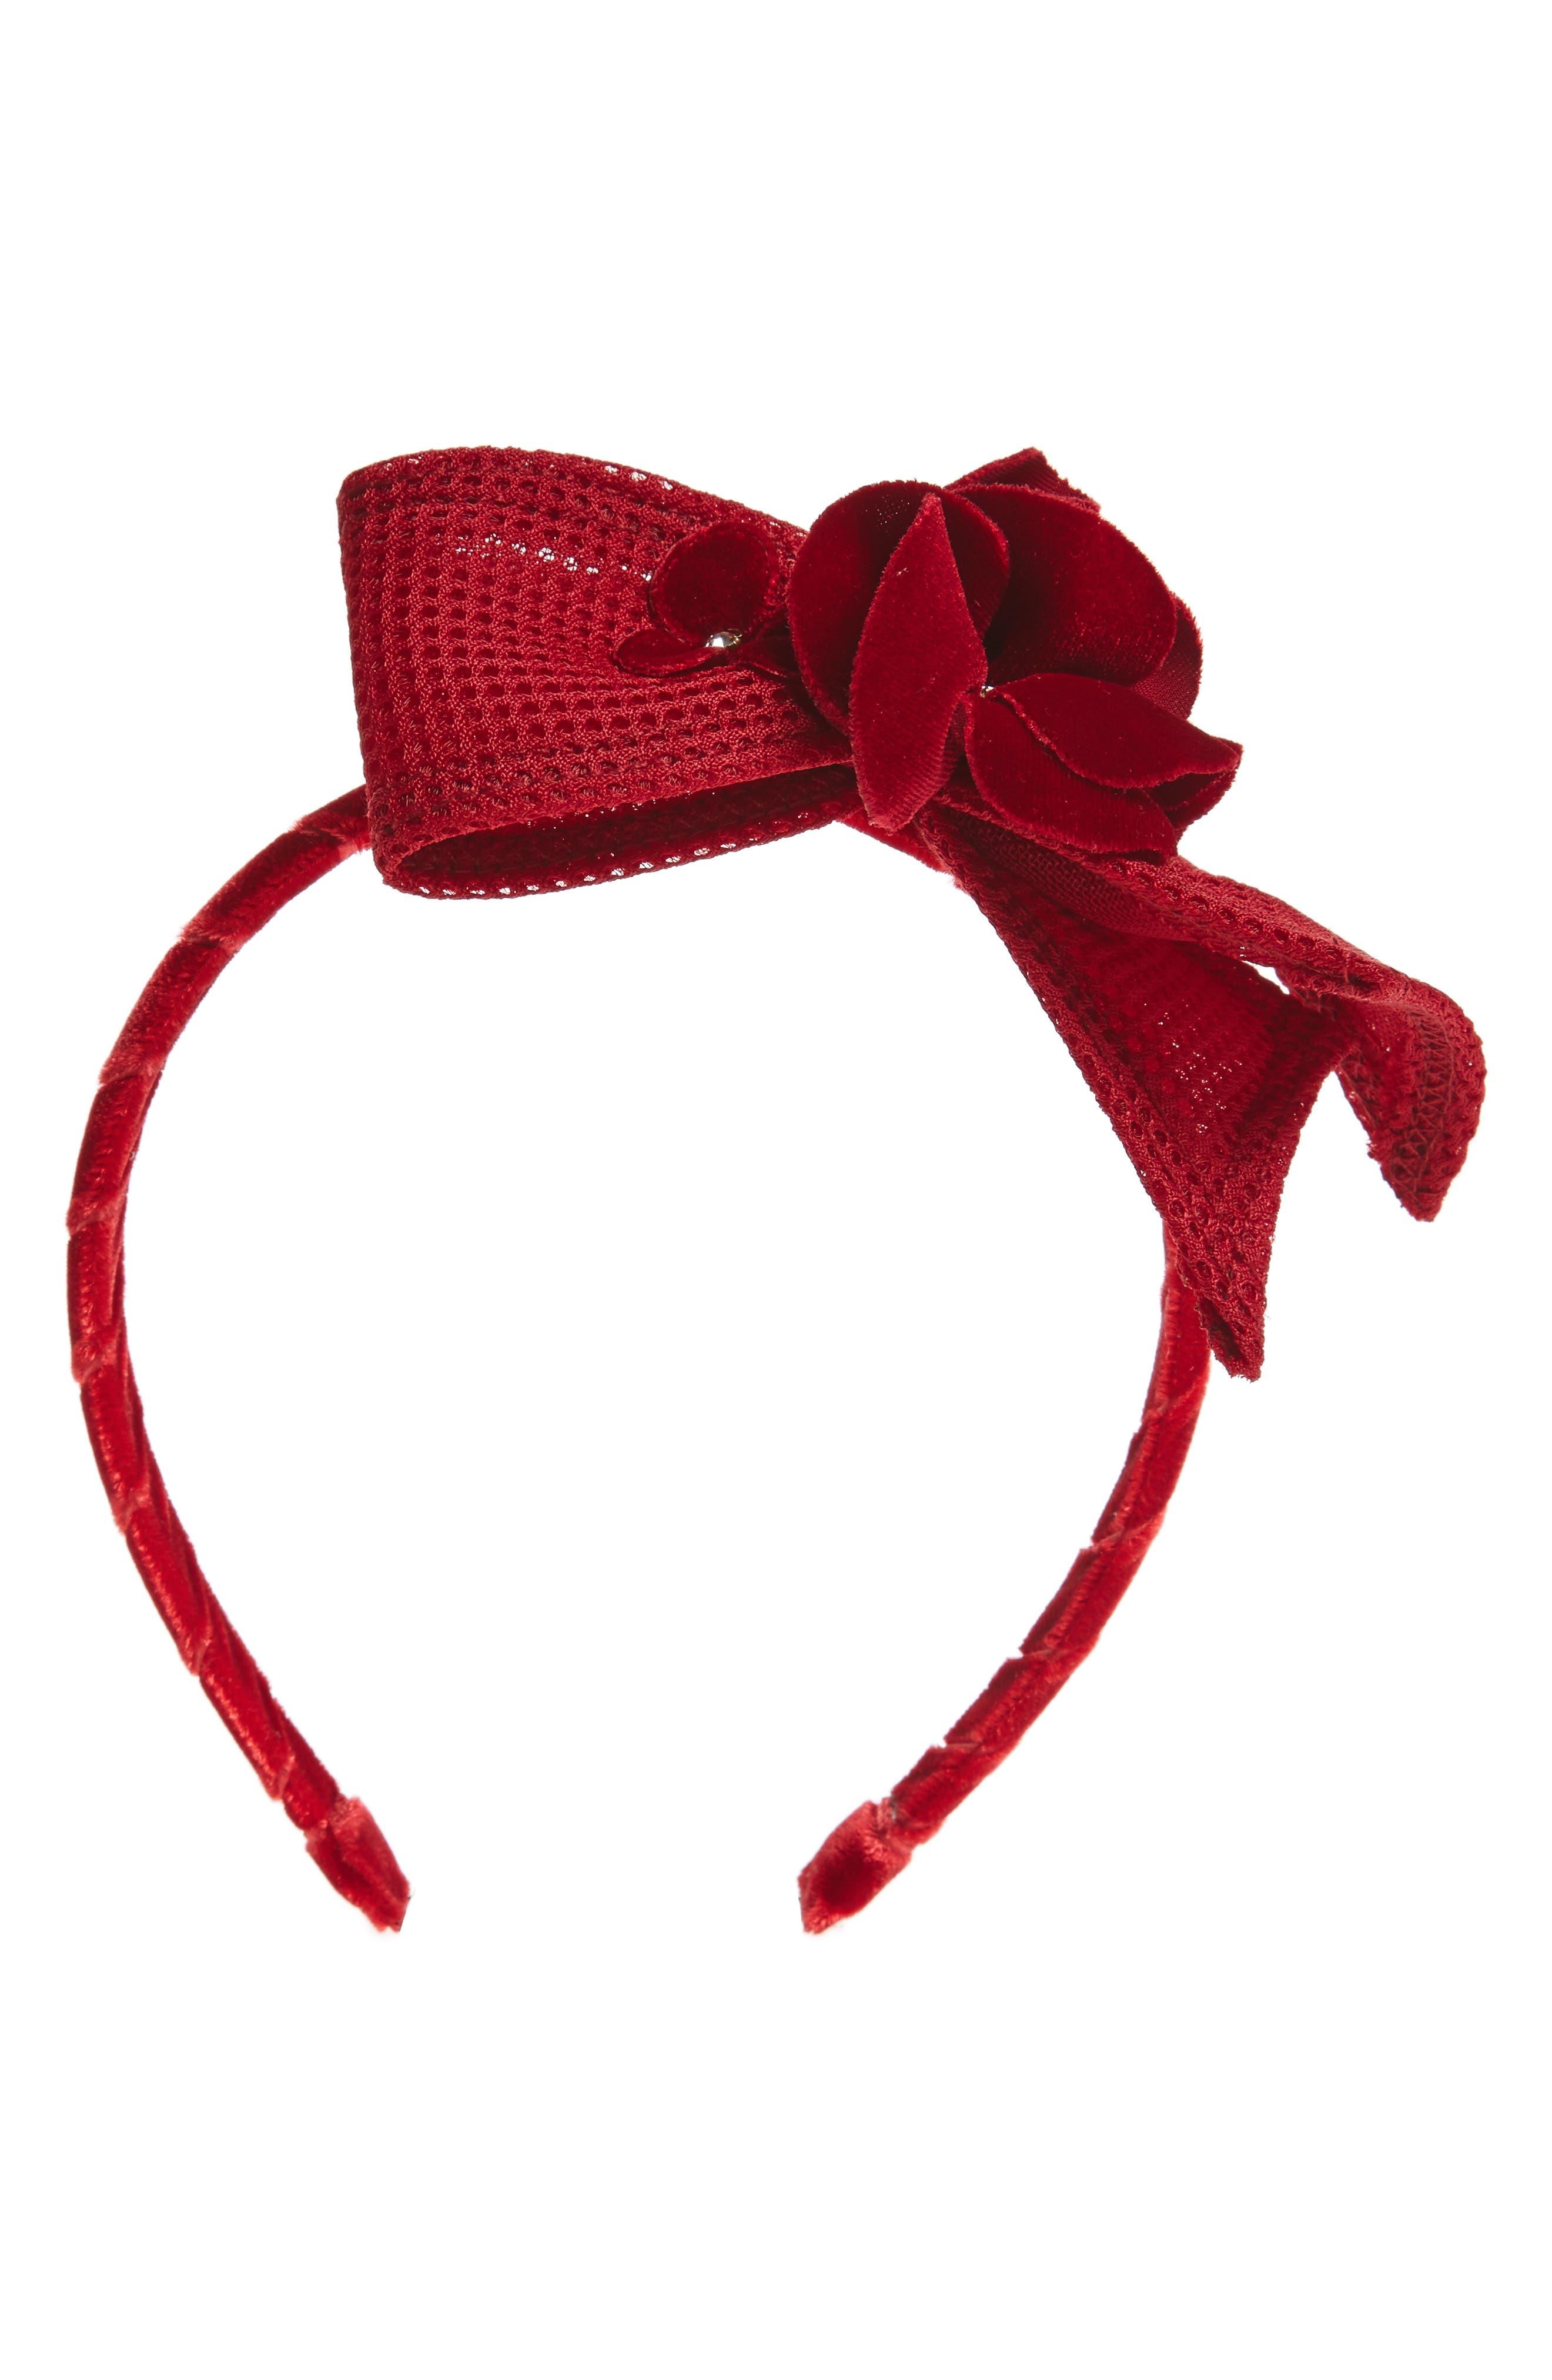 Techno Flower & Bow Headband,                         Main,                         color, Red